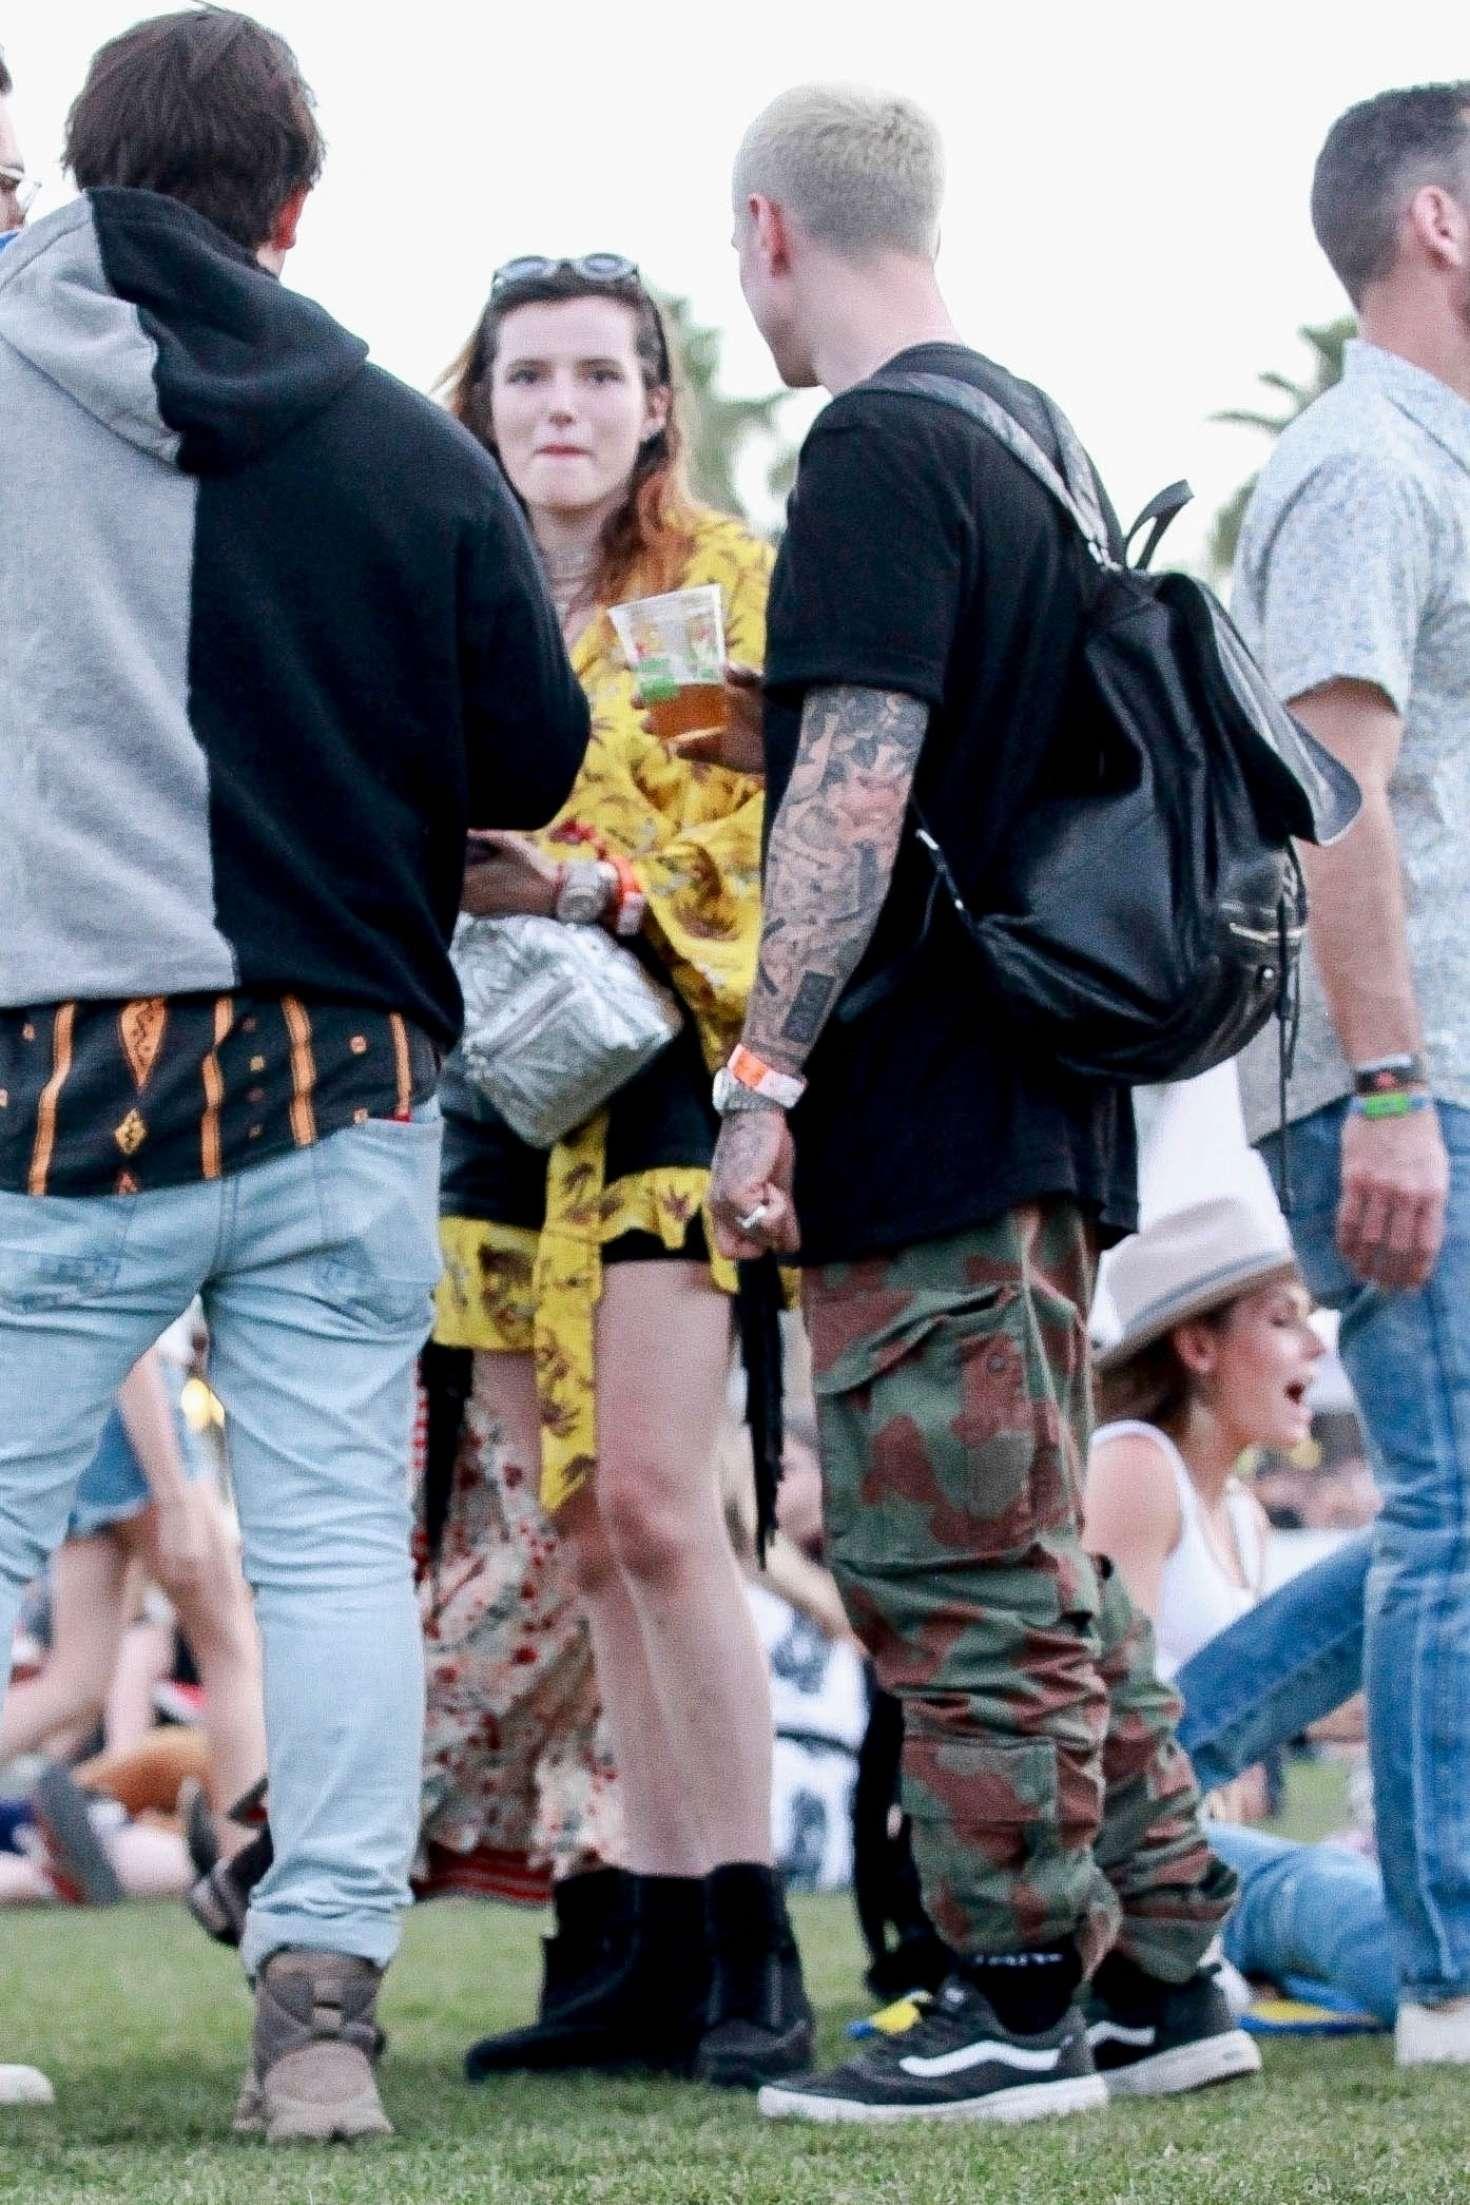 Bella Thorne 2019 : Bella Thorne at 2019 Coachella -03